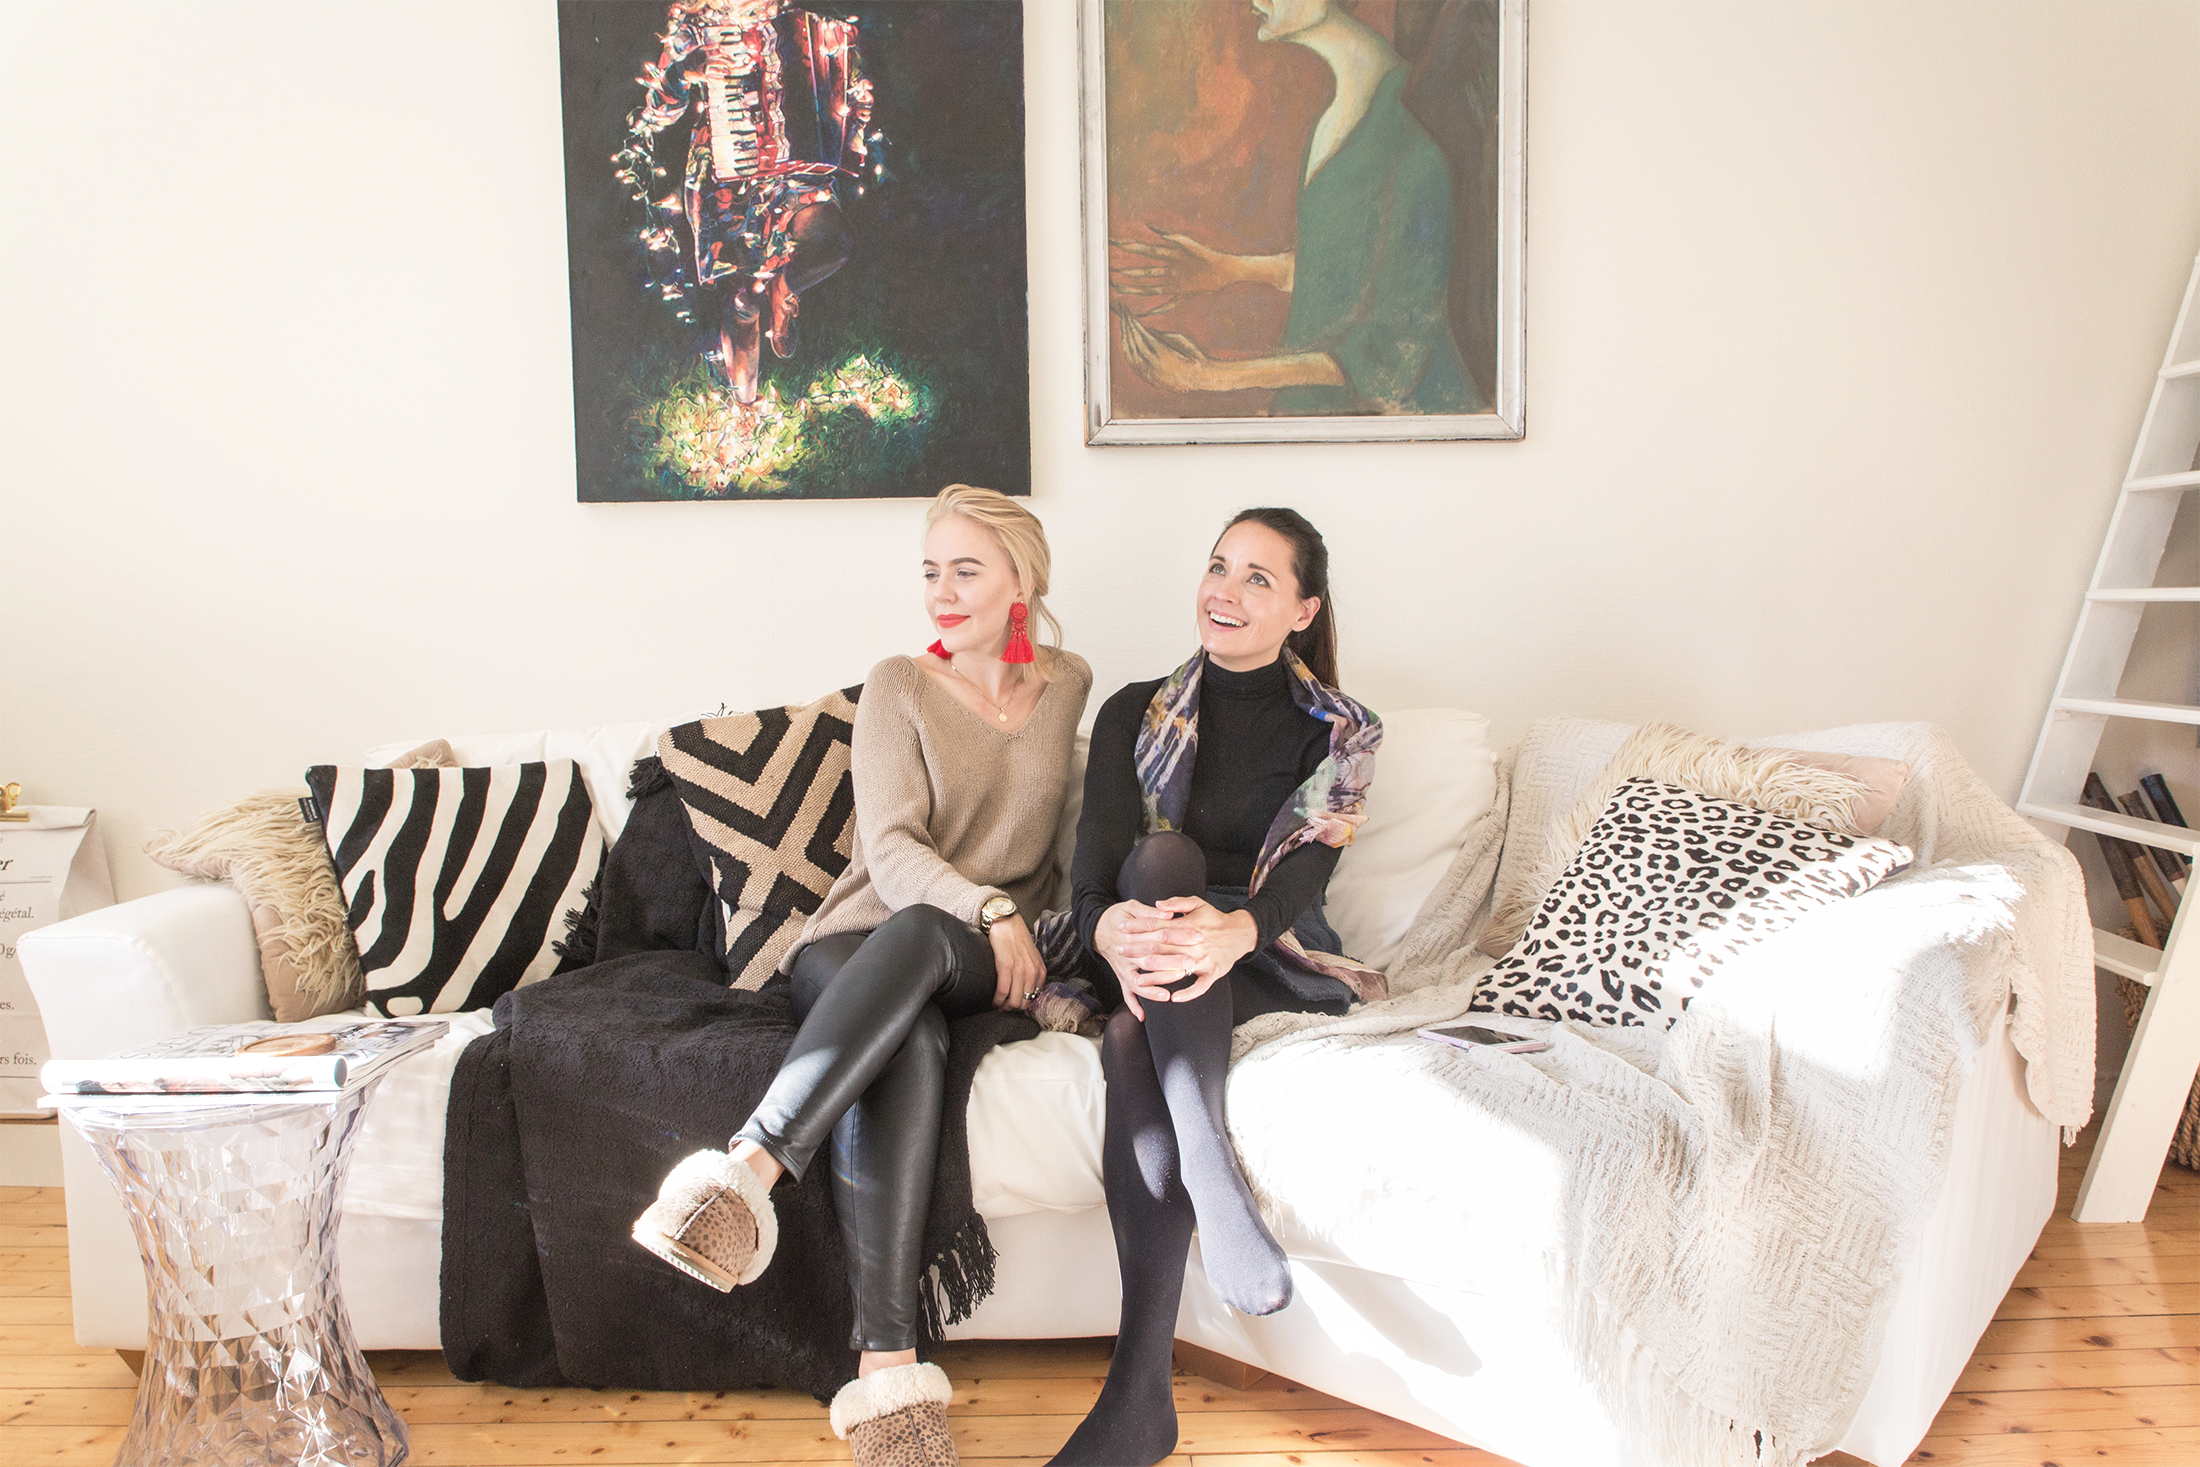 Stylisti Emma ja Maija